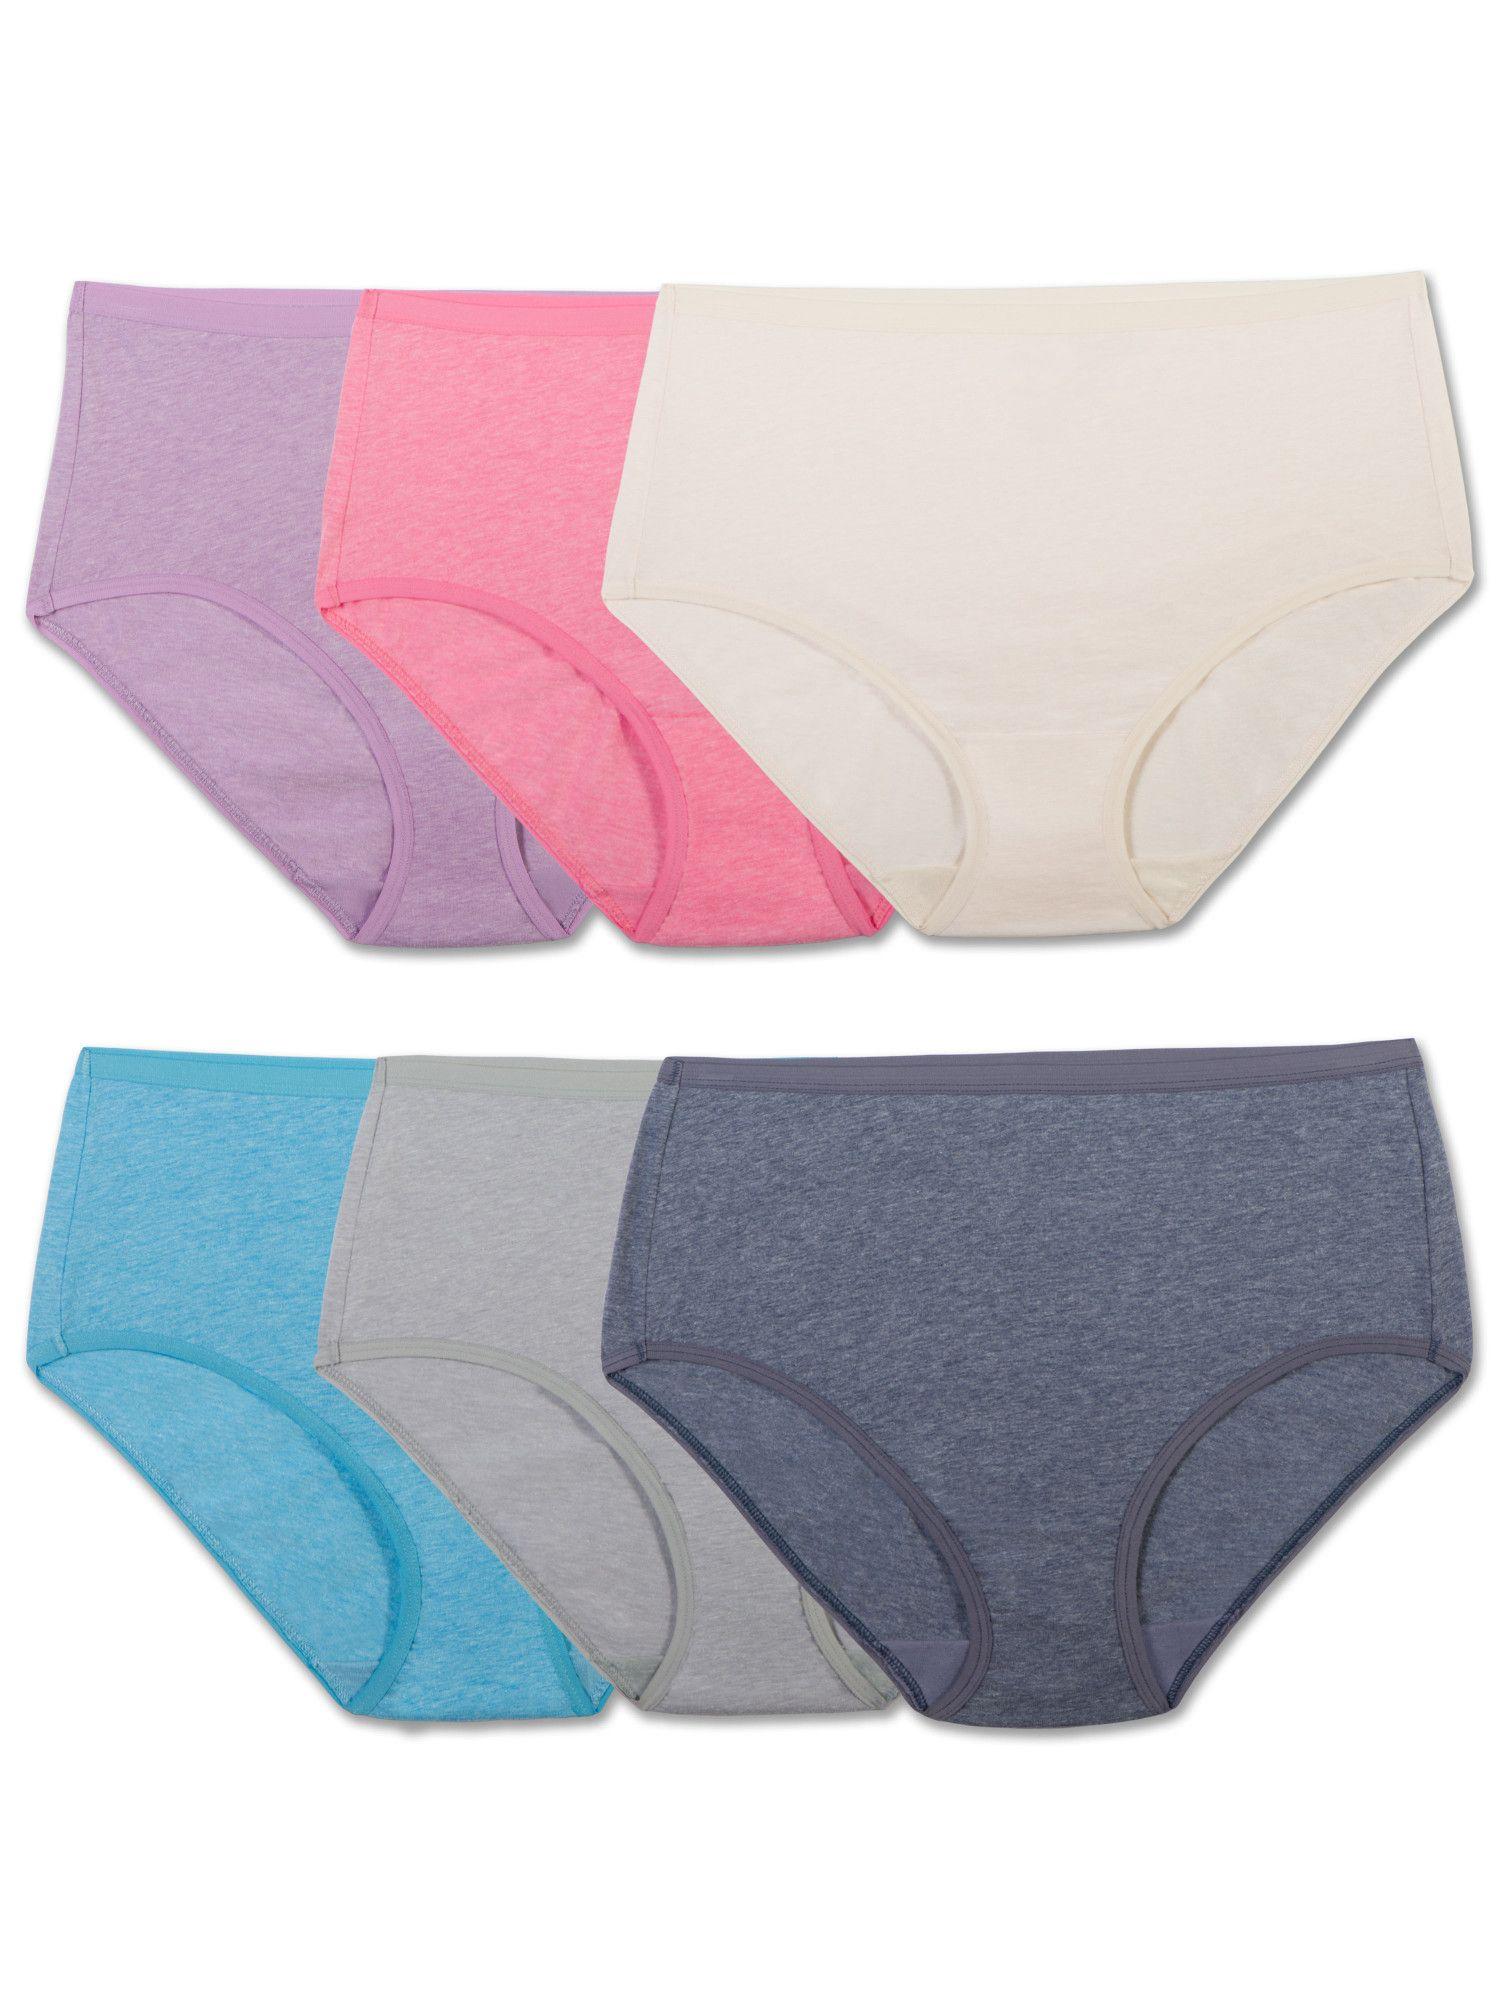 886901fccd37 Women's Beyondsoft Brief Panties - 6 Pack#Beyondsoft, #Women, #Pack ...